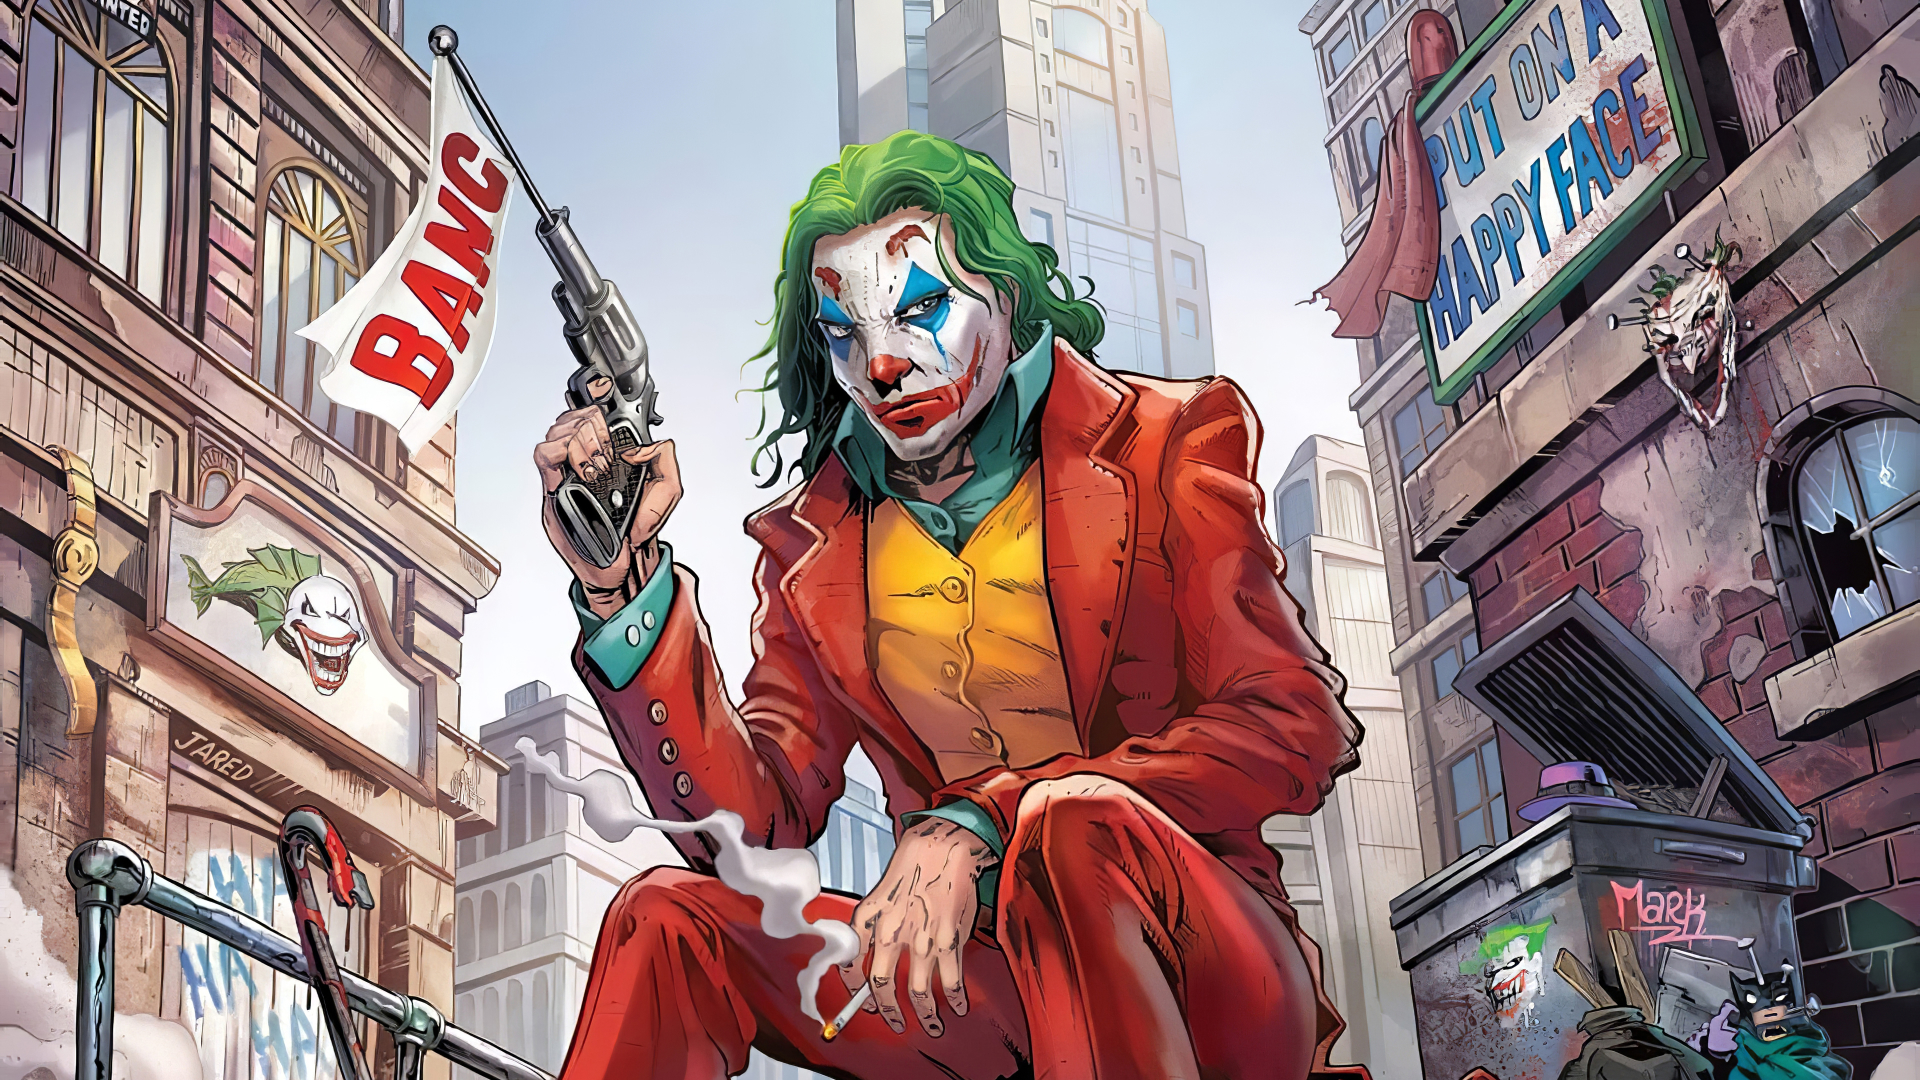 1280x720 Joker Comic 4K 720P Wallpaper, HD Superheroes 4K ...